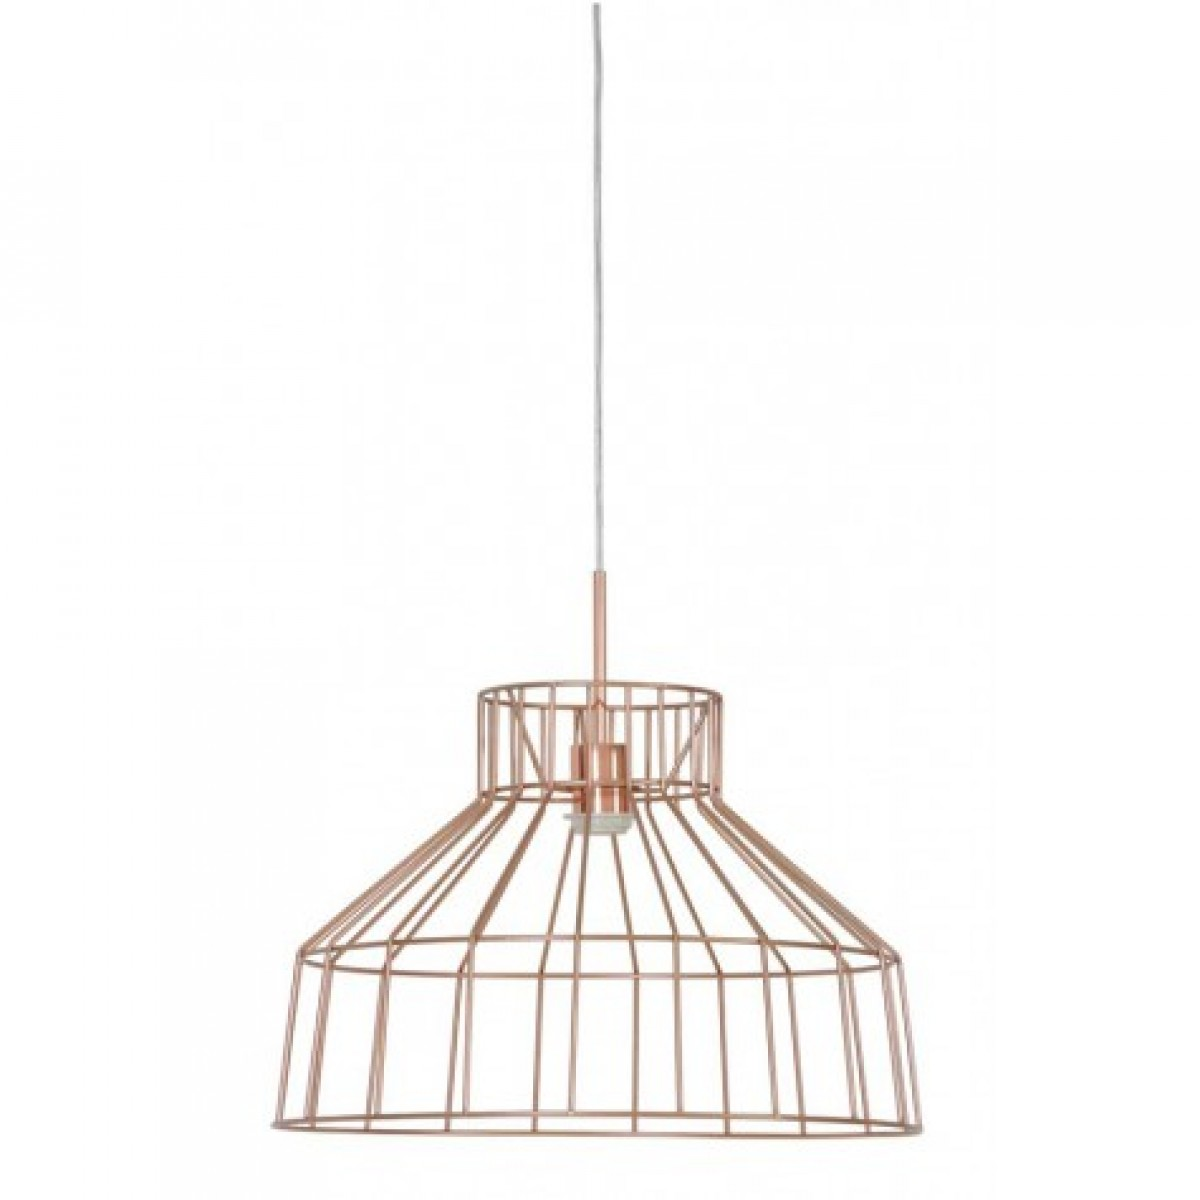 pendelleuchte kupfer metall pendellampe draht metall h ngeleuchte metall kupfer 47 cm. Black Bedroom Furniture Sets. Home Design Ideas